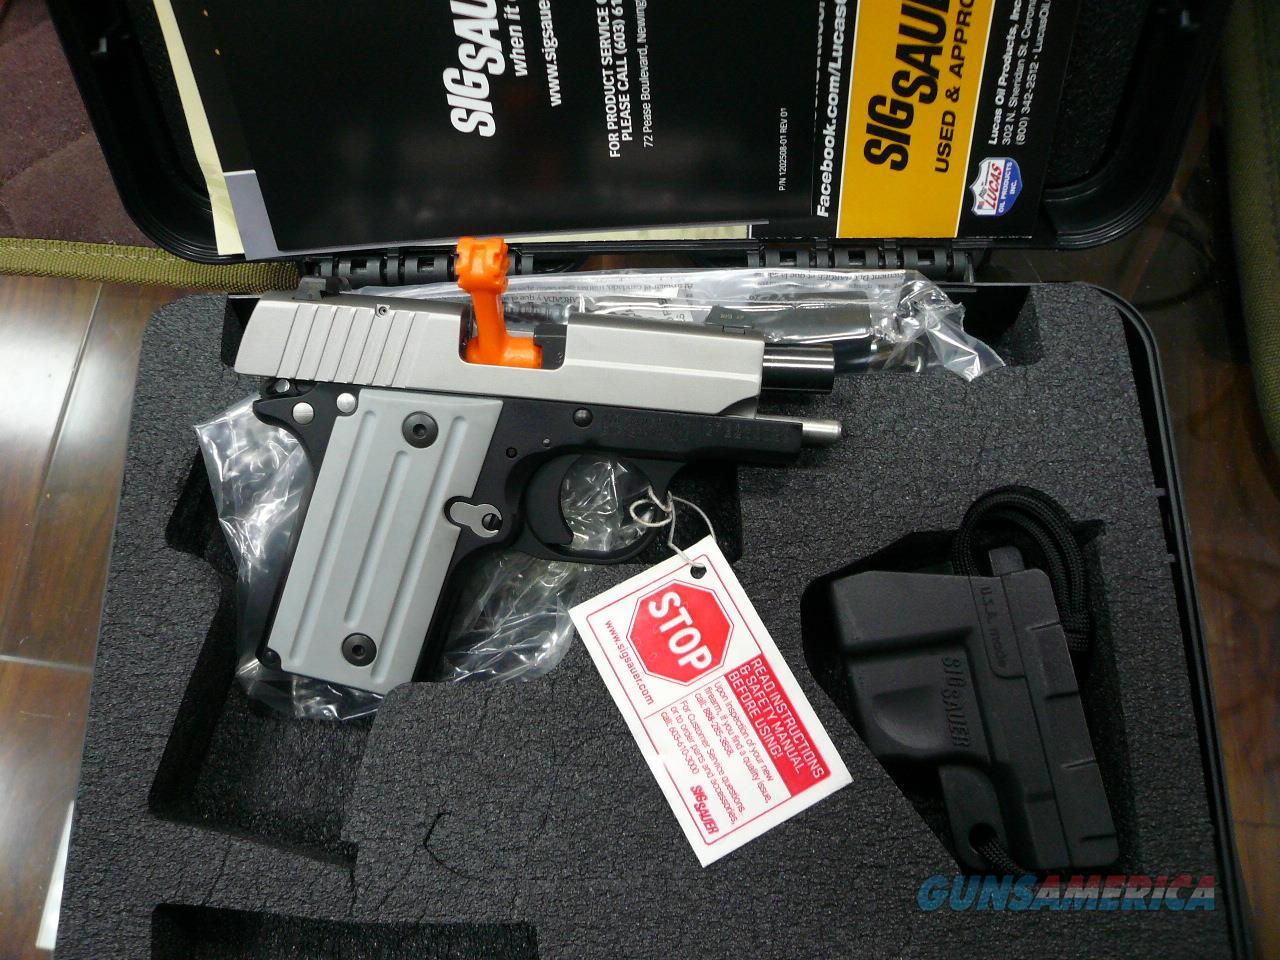 P238-TSS-CA 380ACP NIB  Guns > Pistols > Sig - Sauer/Sigarms Pistols > P238